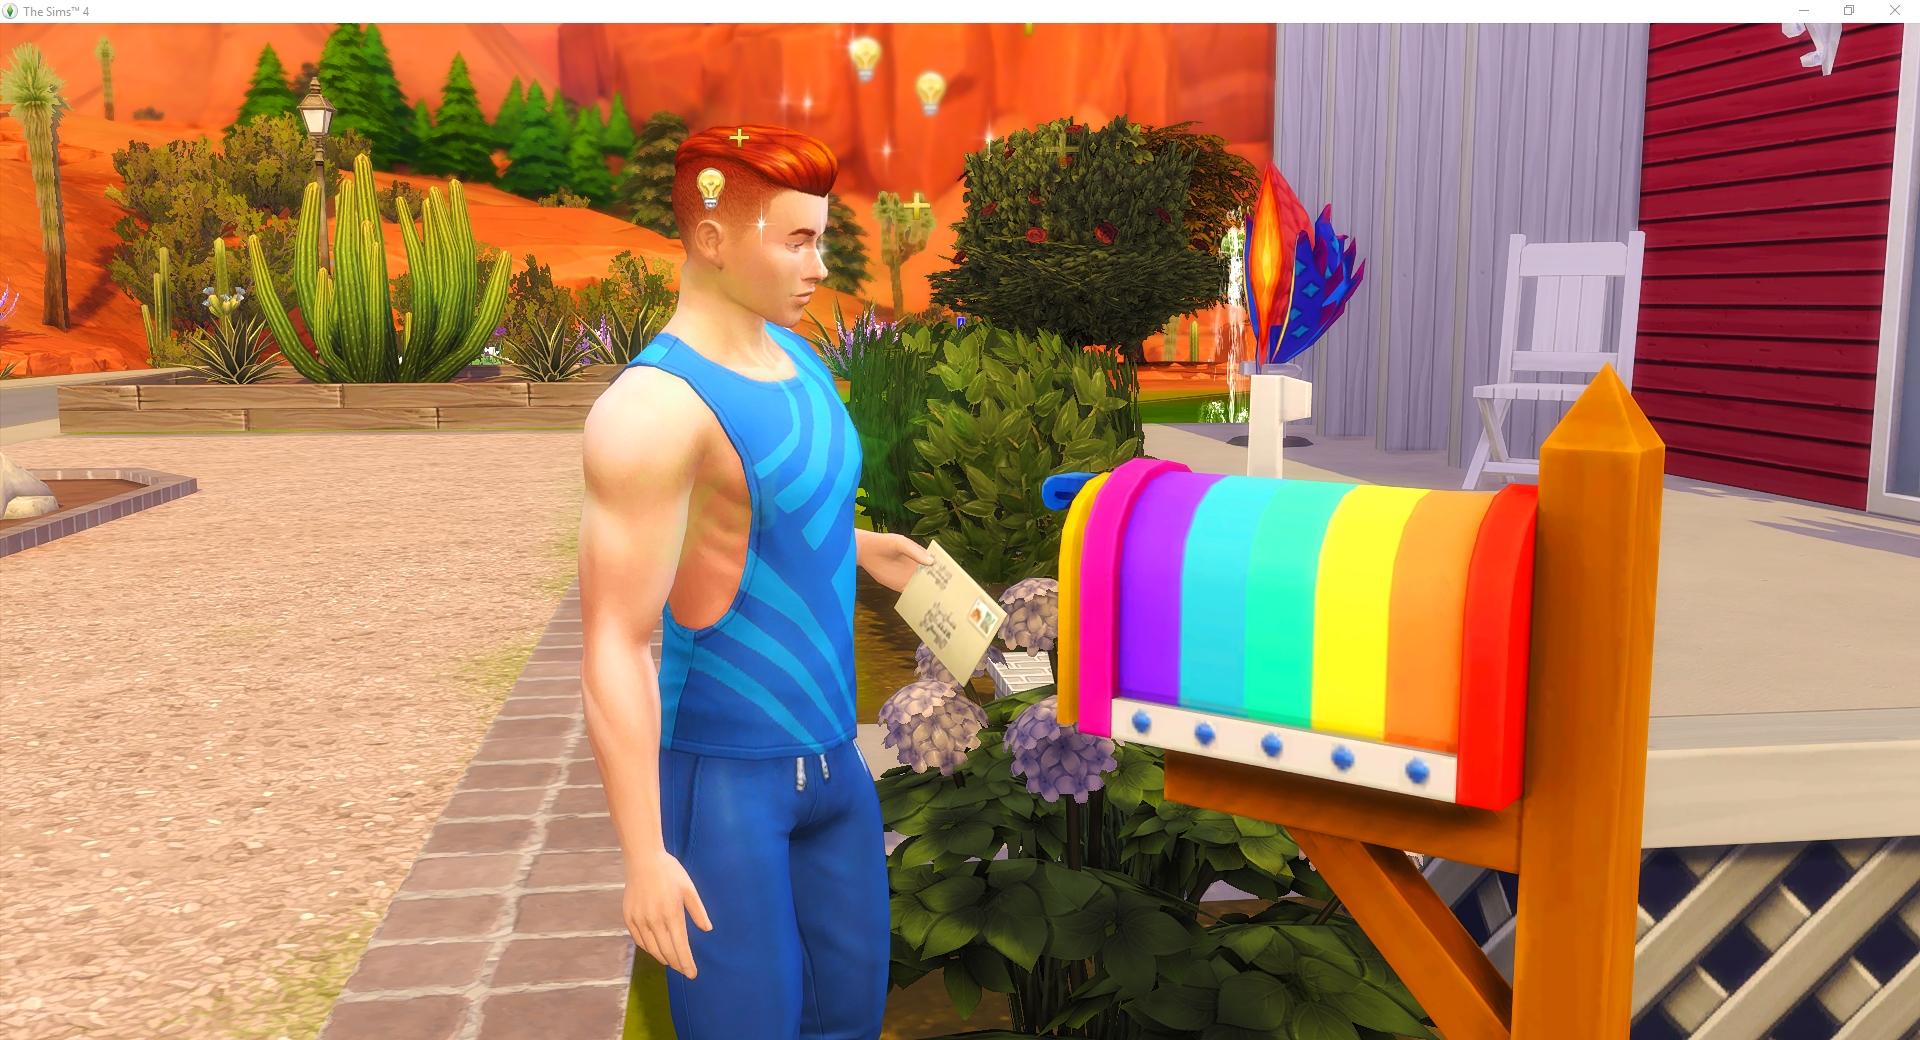 Masterful Sims: The Grump